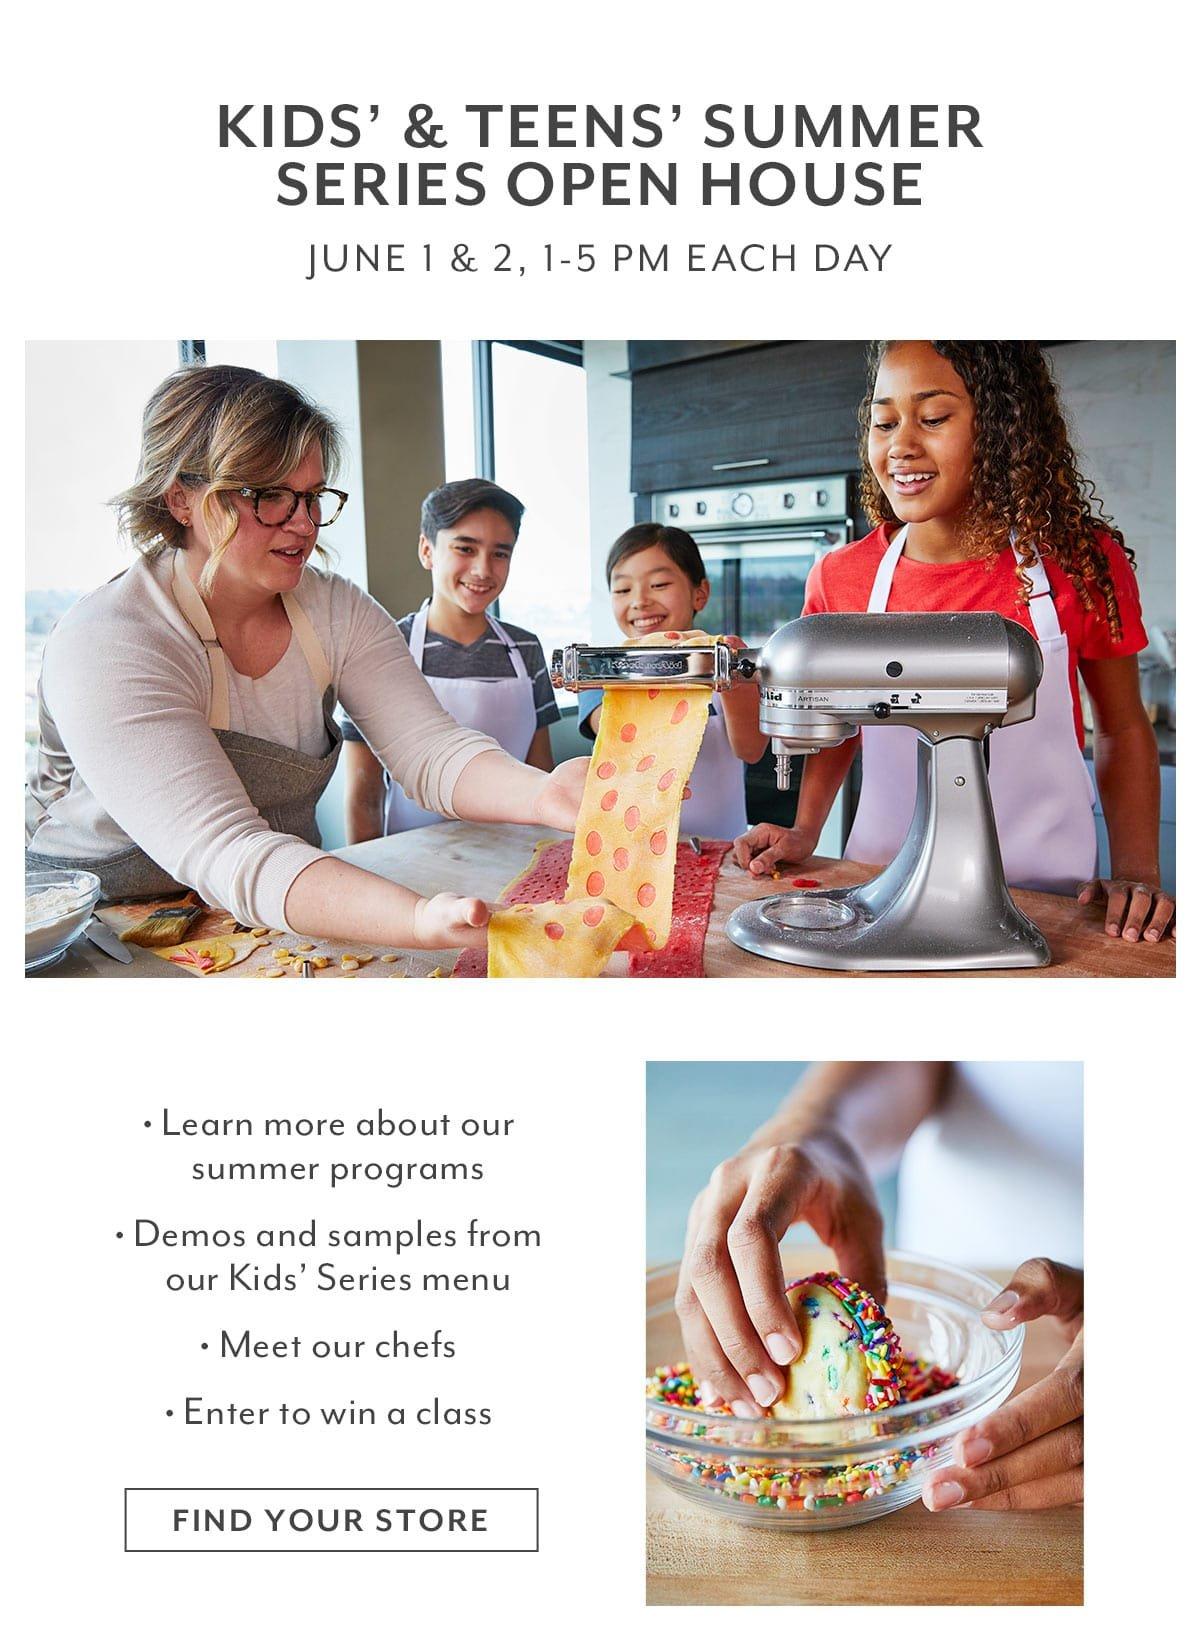 Kids' & Teens Summer Series Open House • In Stores This Weekend